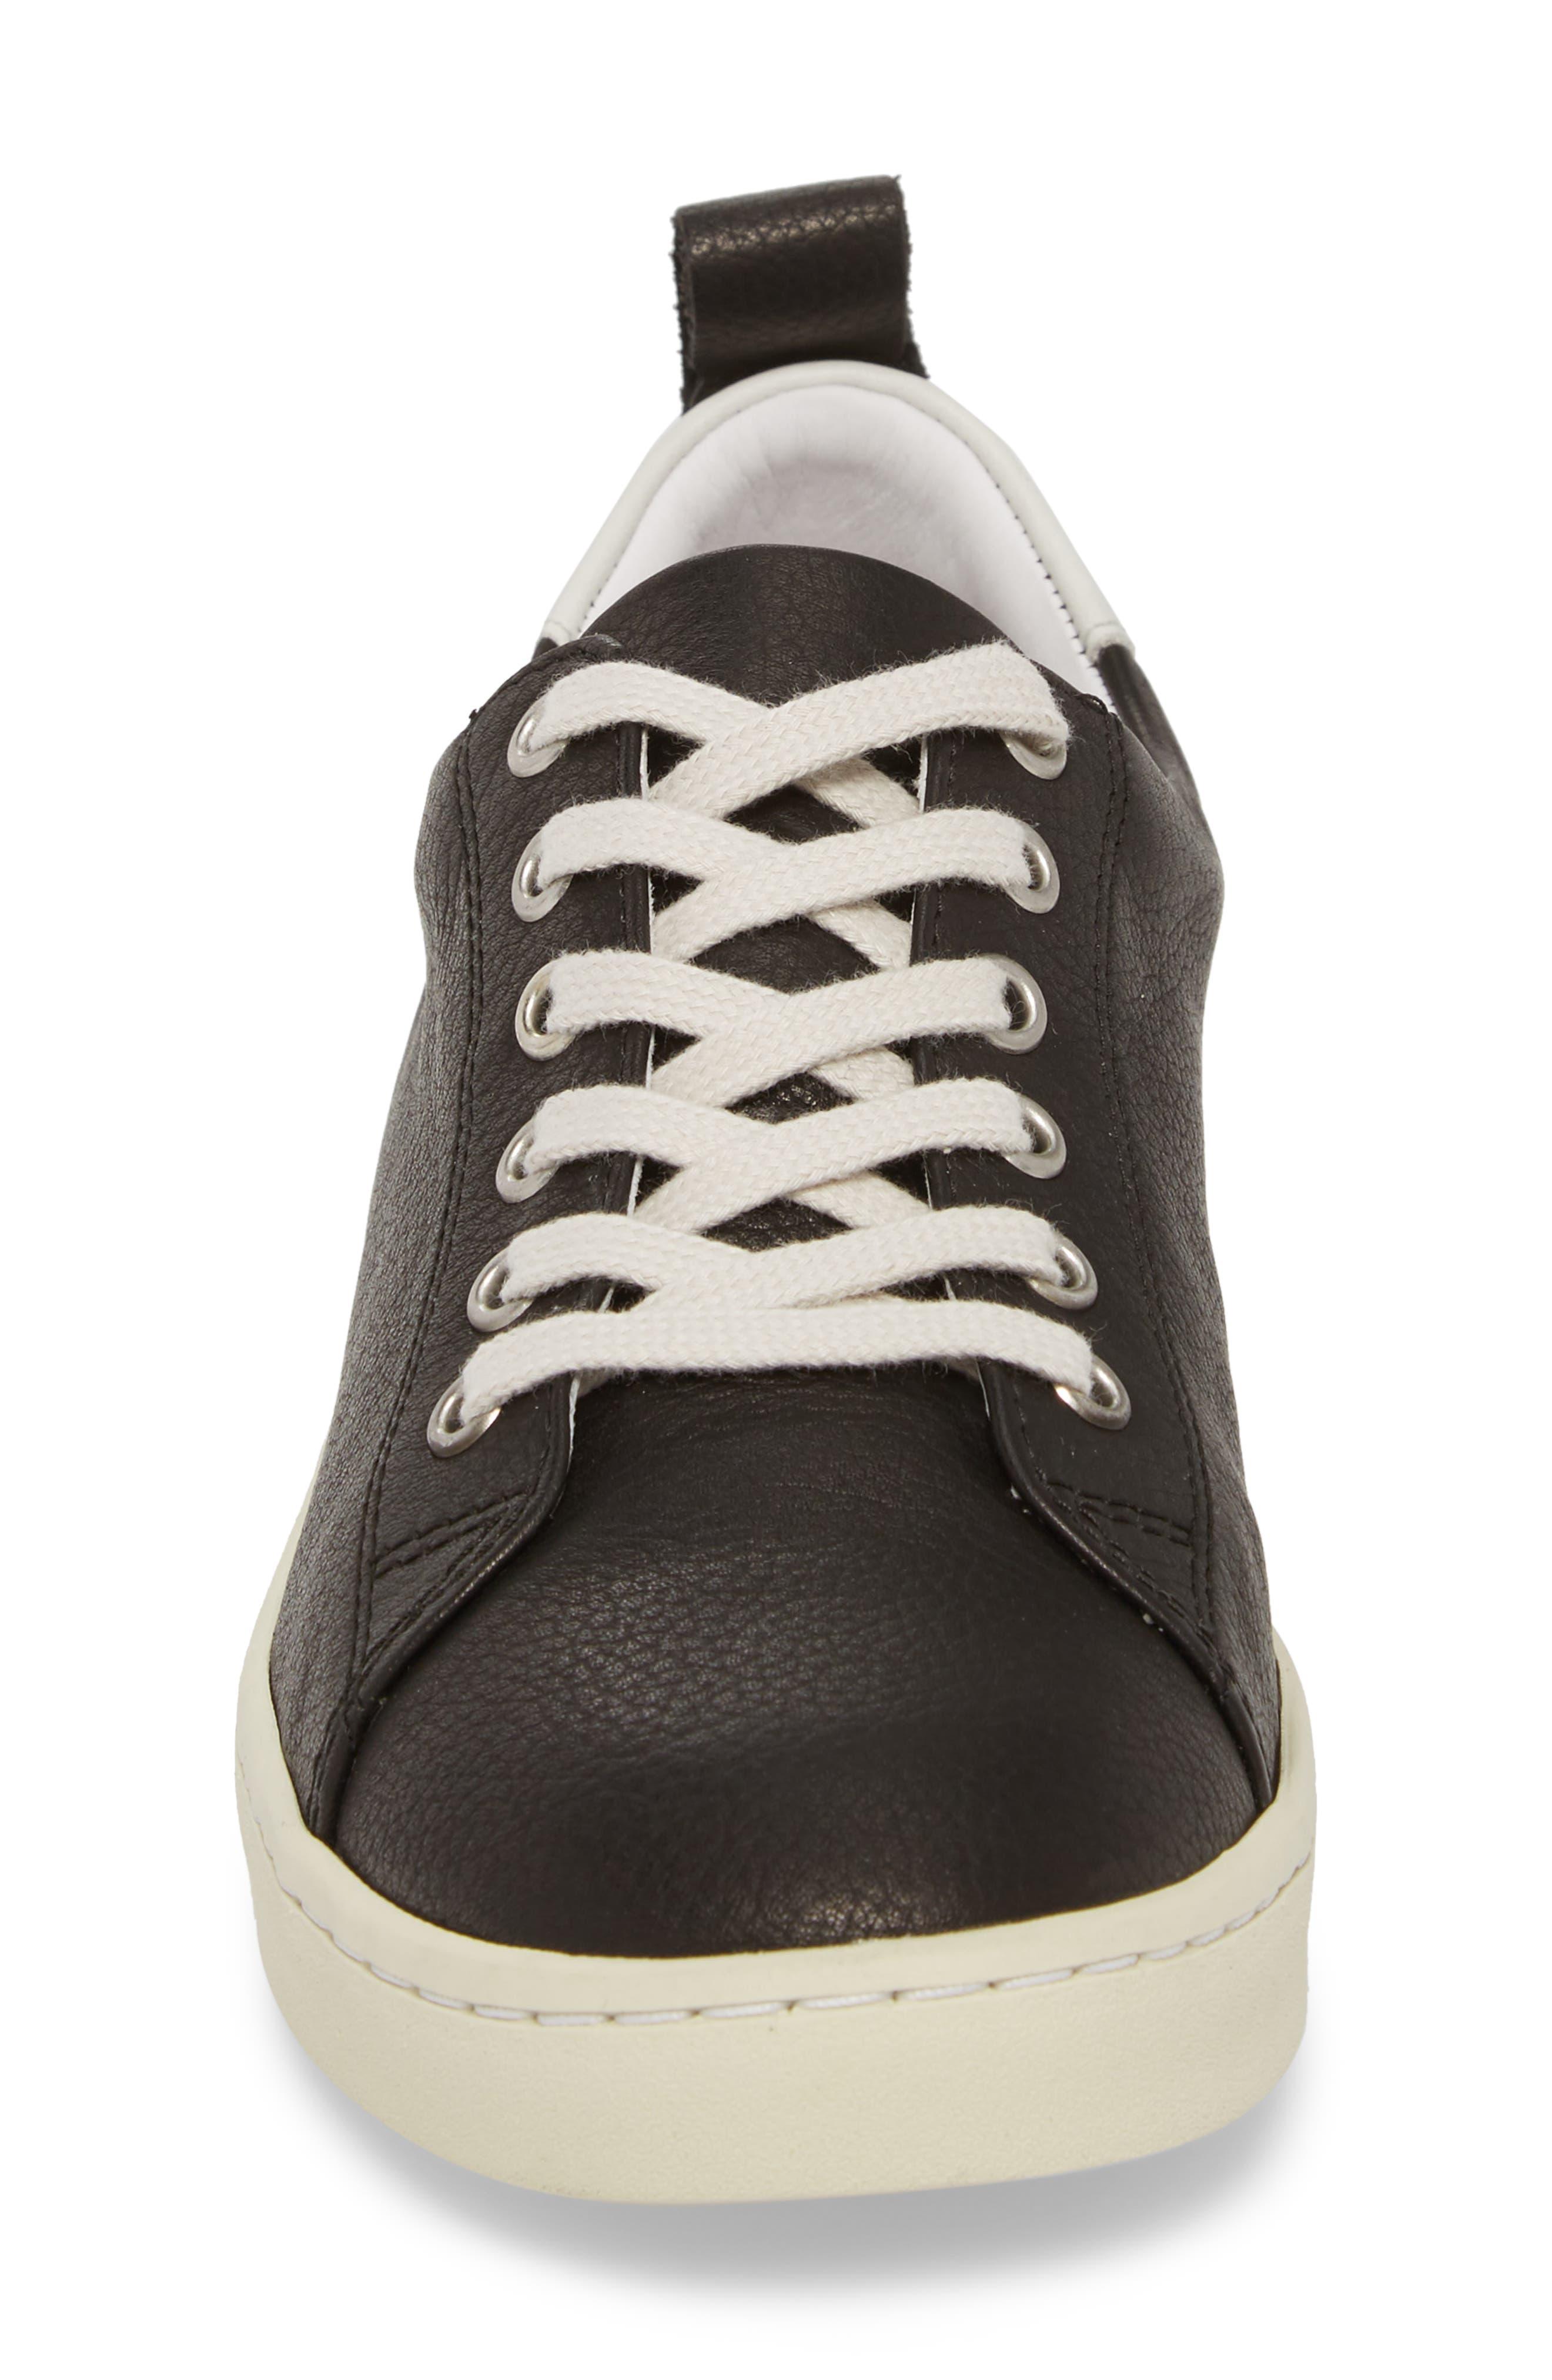 Maku Lace-Up Sneaker,                             Alternate thumbnail 4, color,                             BLACK BRITO LEATHER